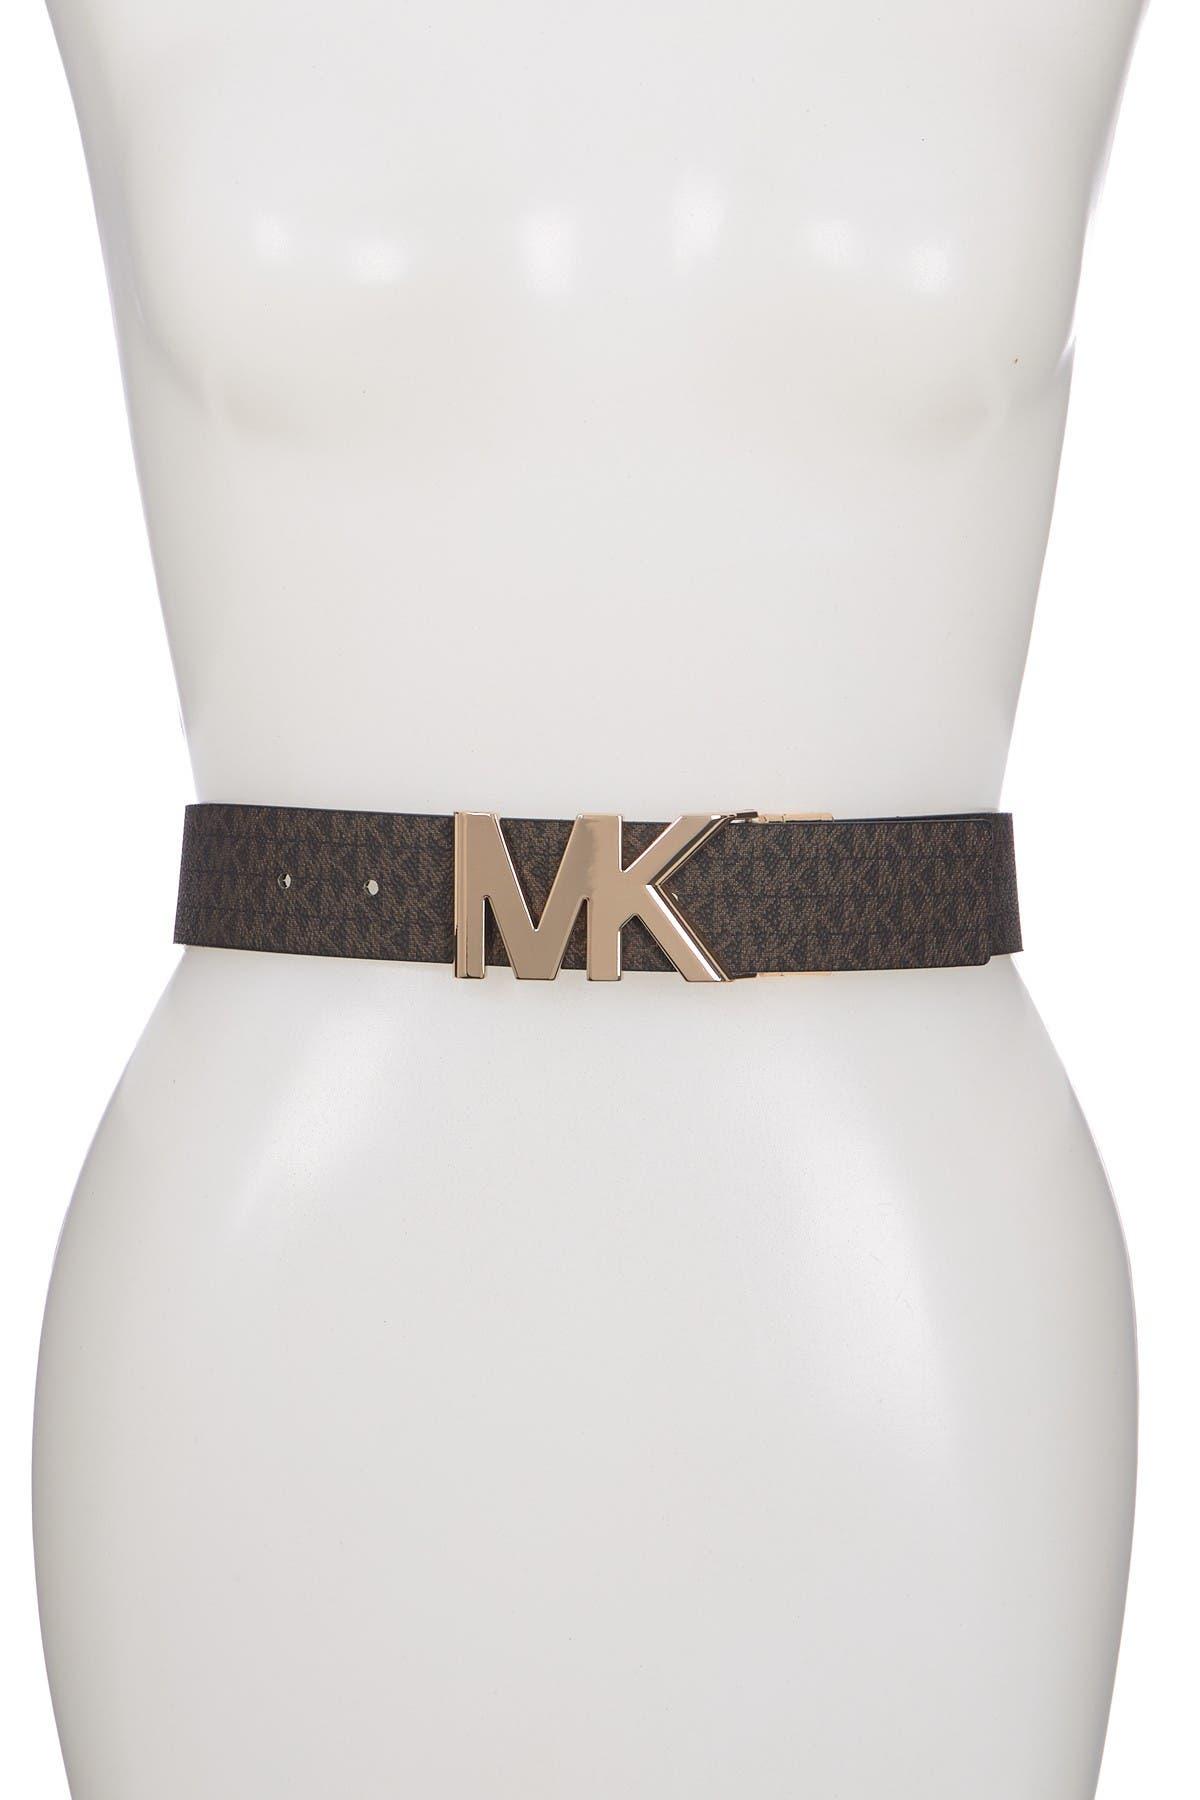 Image of Michael Kors Reversible Logo Print Belt